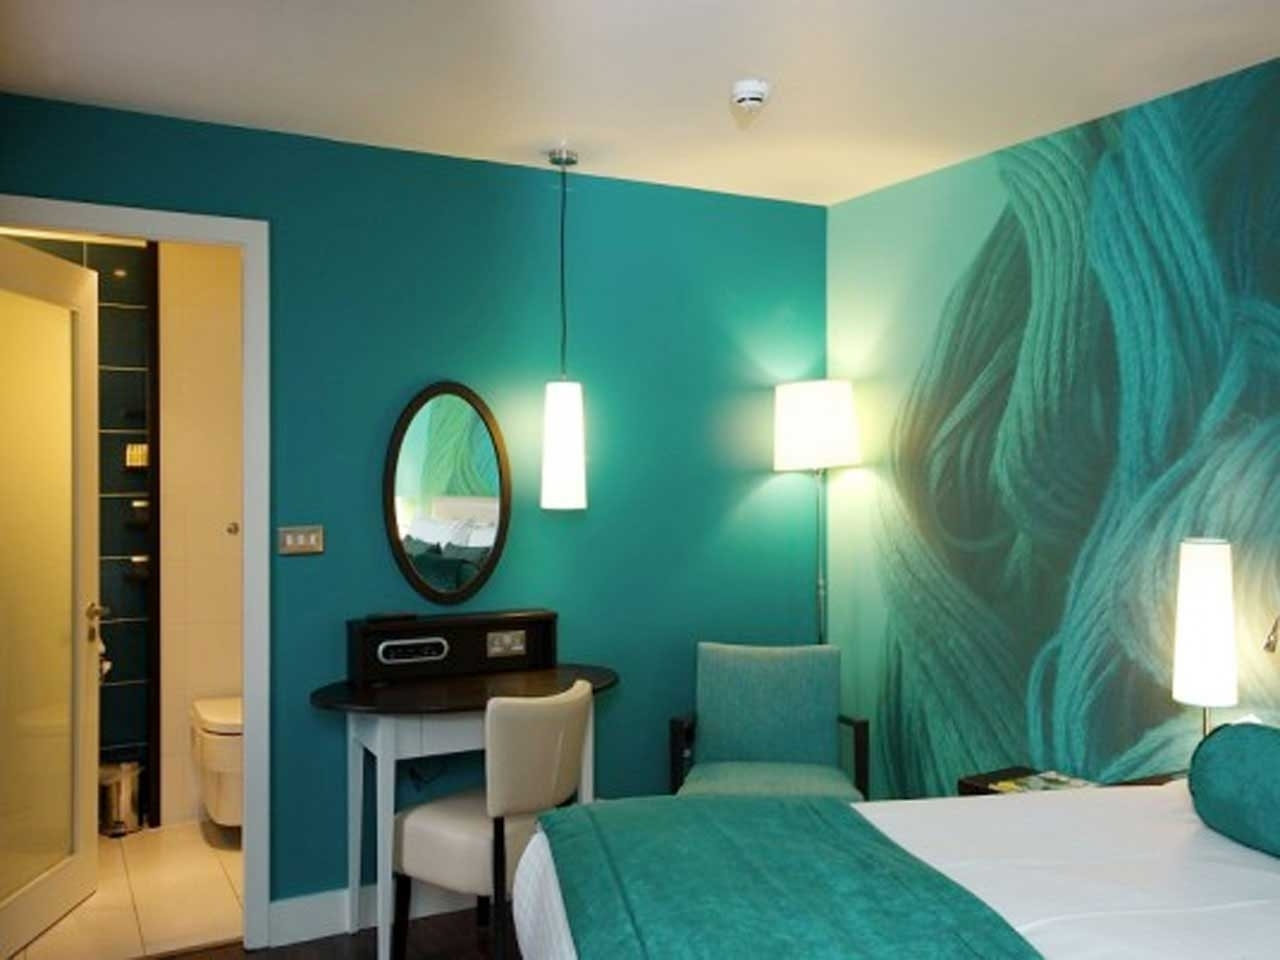 Endearing Two Bination For Bedroom Walls Of Uncategorized Wall Binations Paint Modern